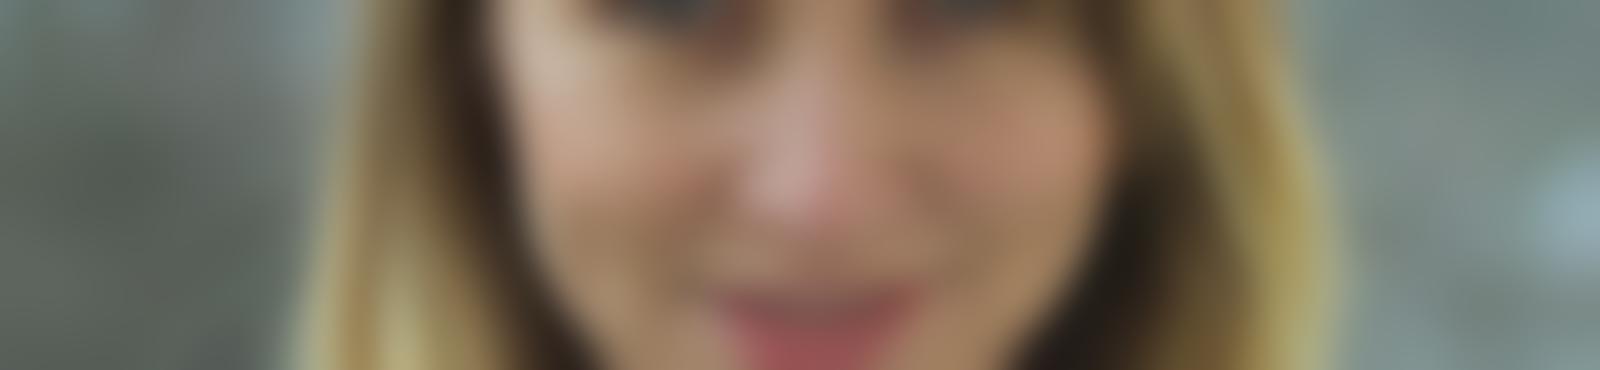 Blurred 570a7b58 de54 465a a239 78456e09c199